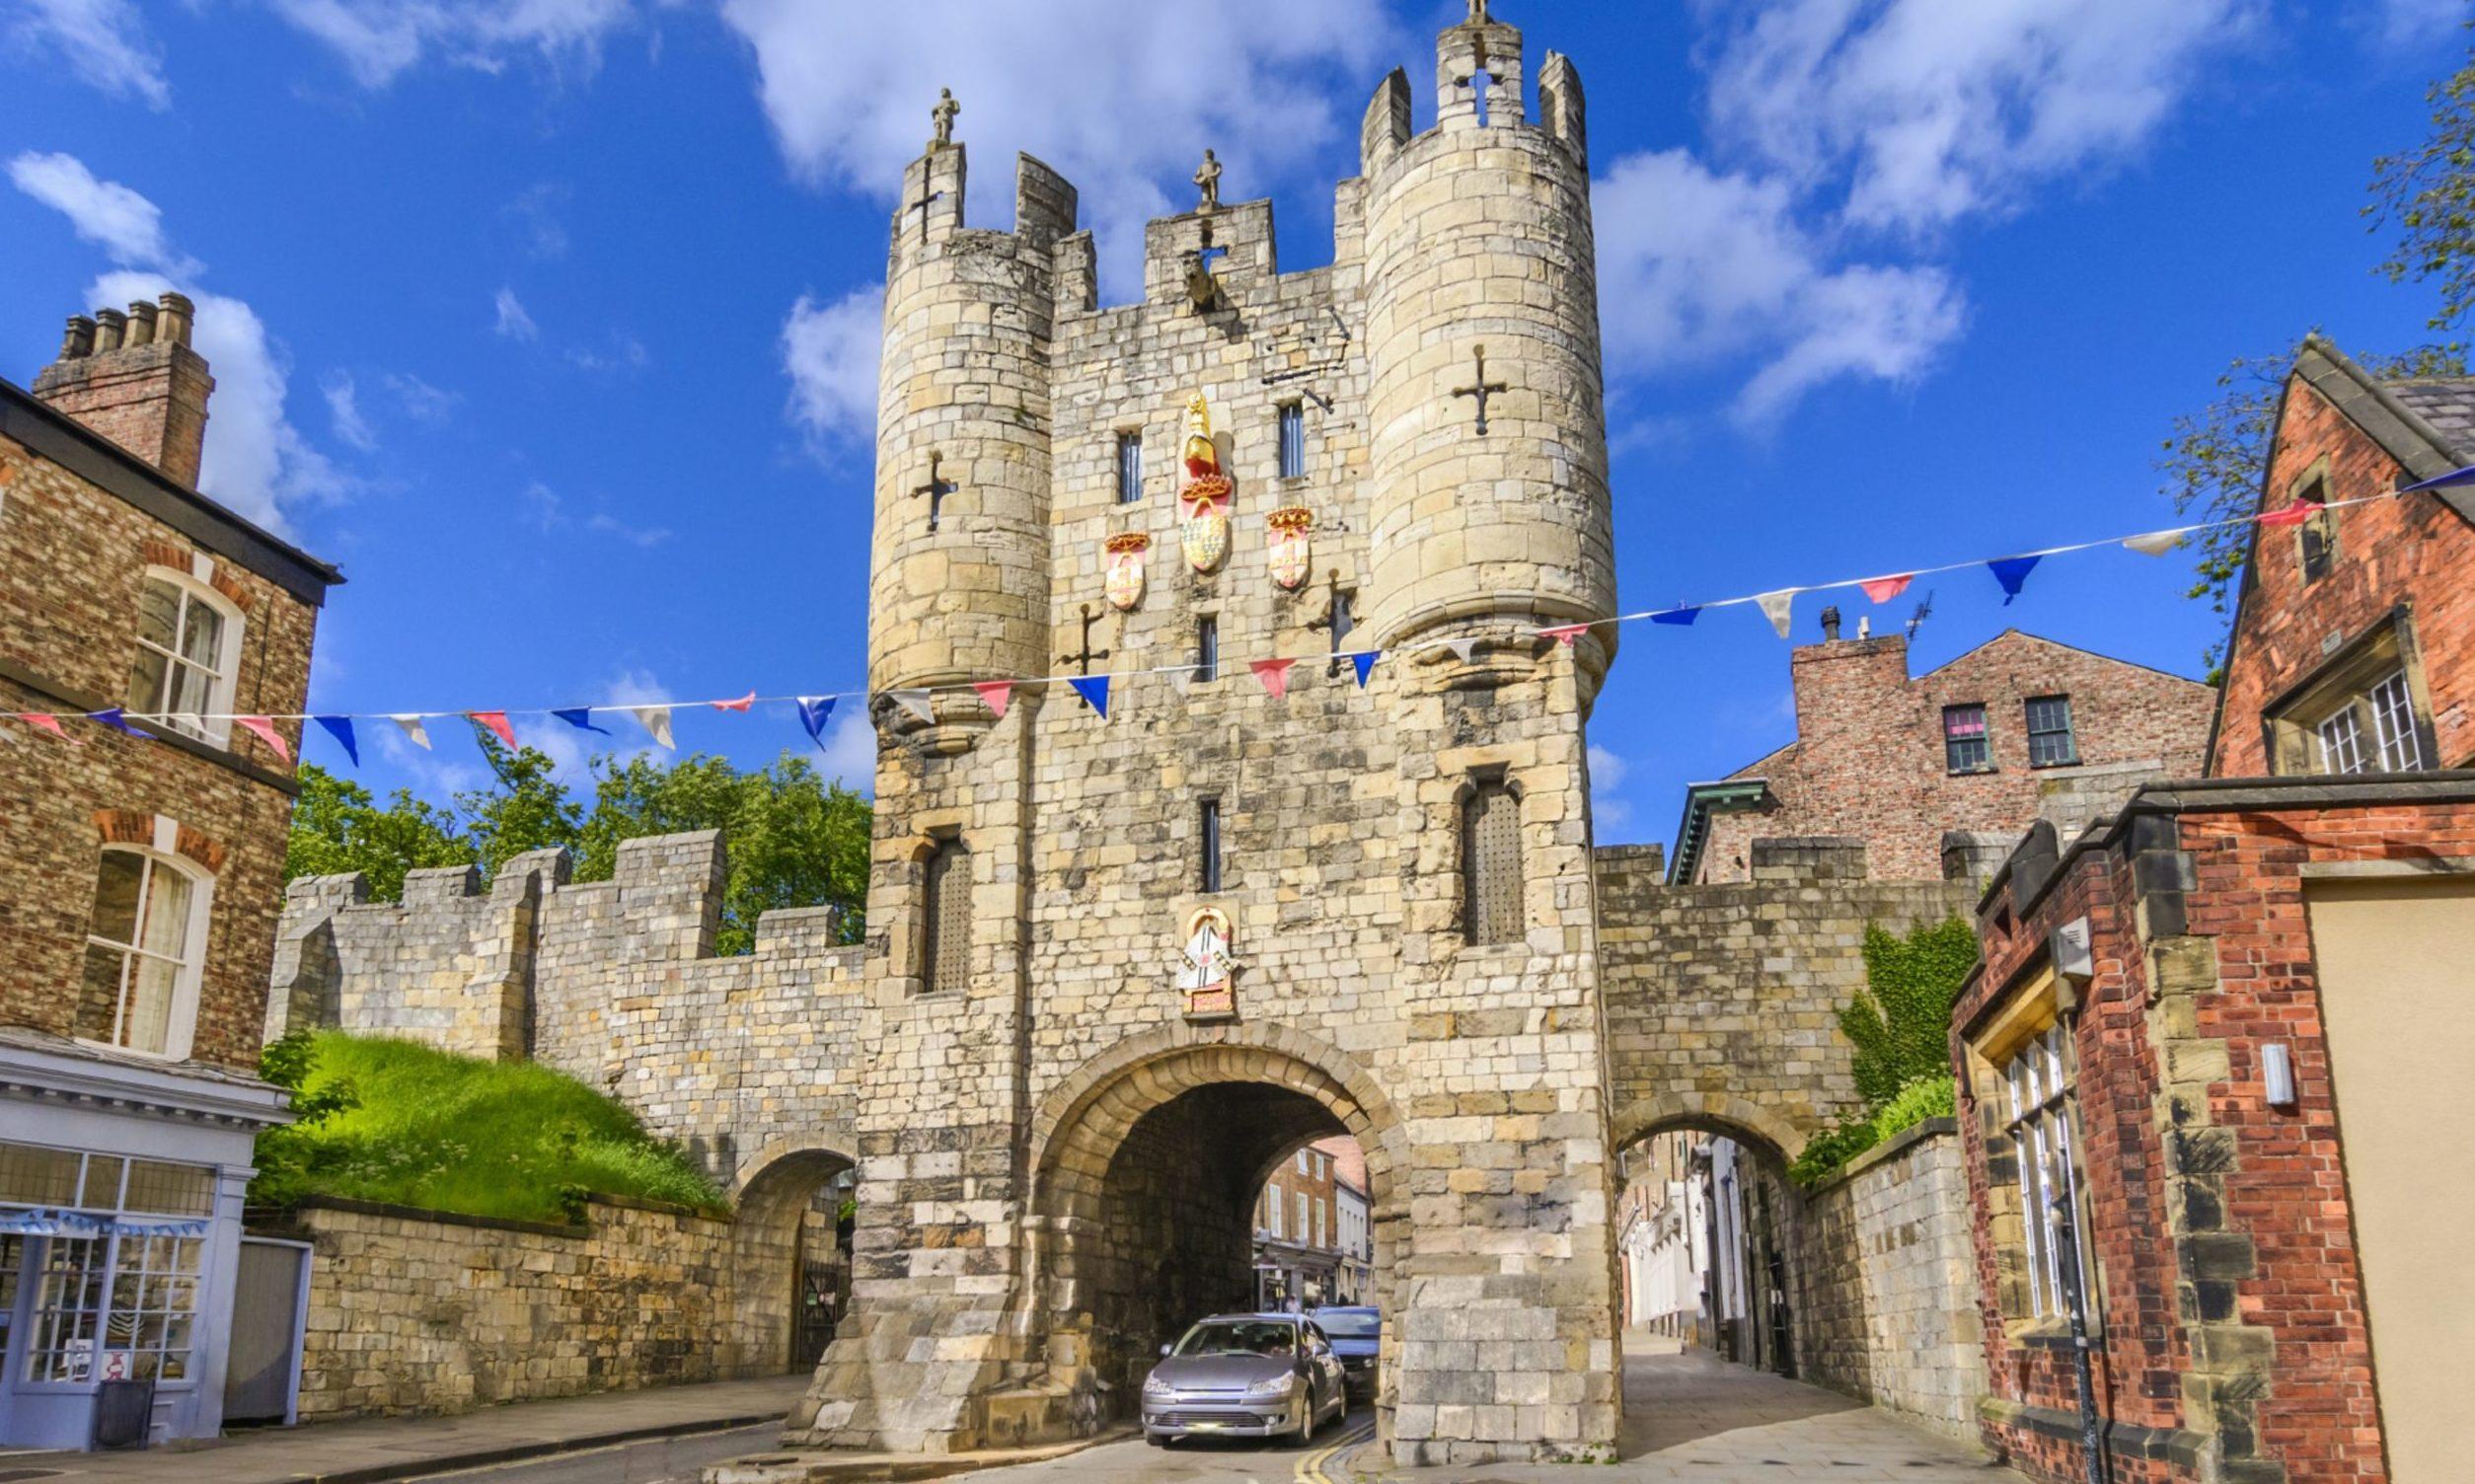 Micklegate, the old medieval gate of York.